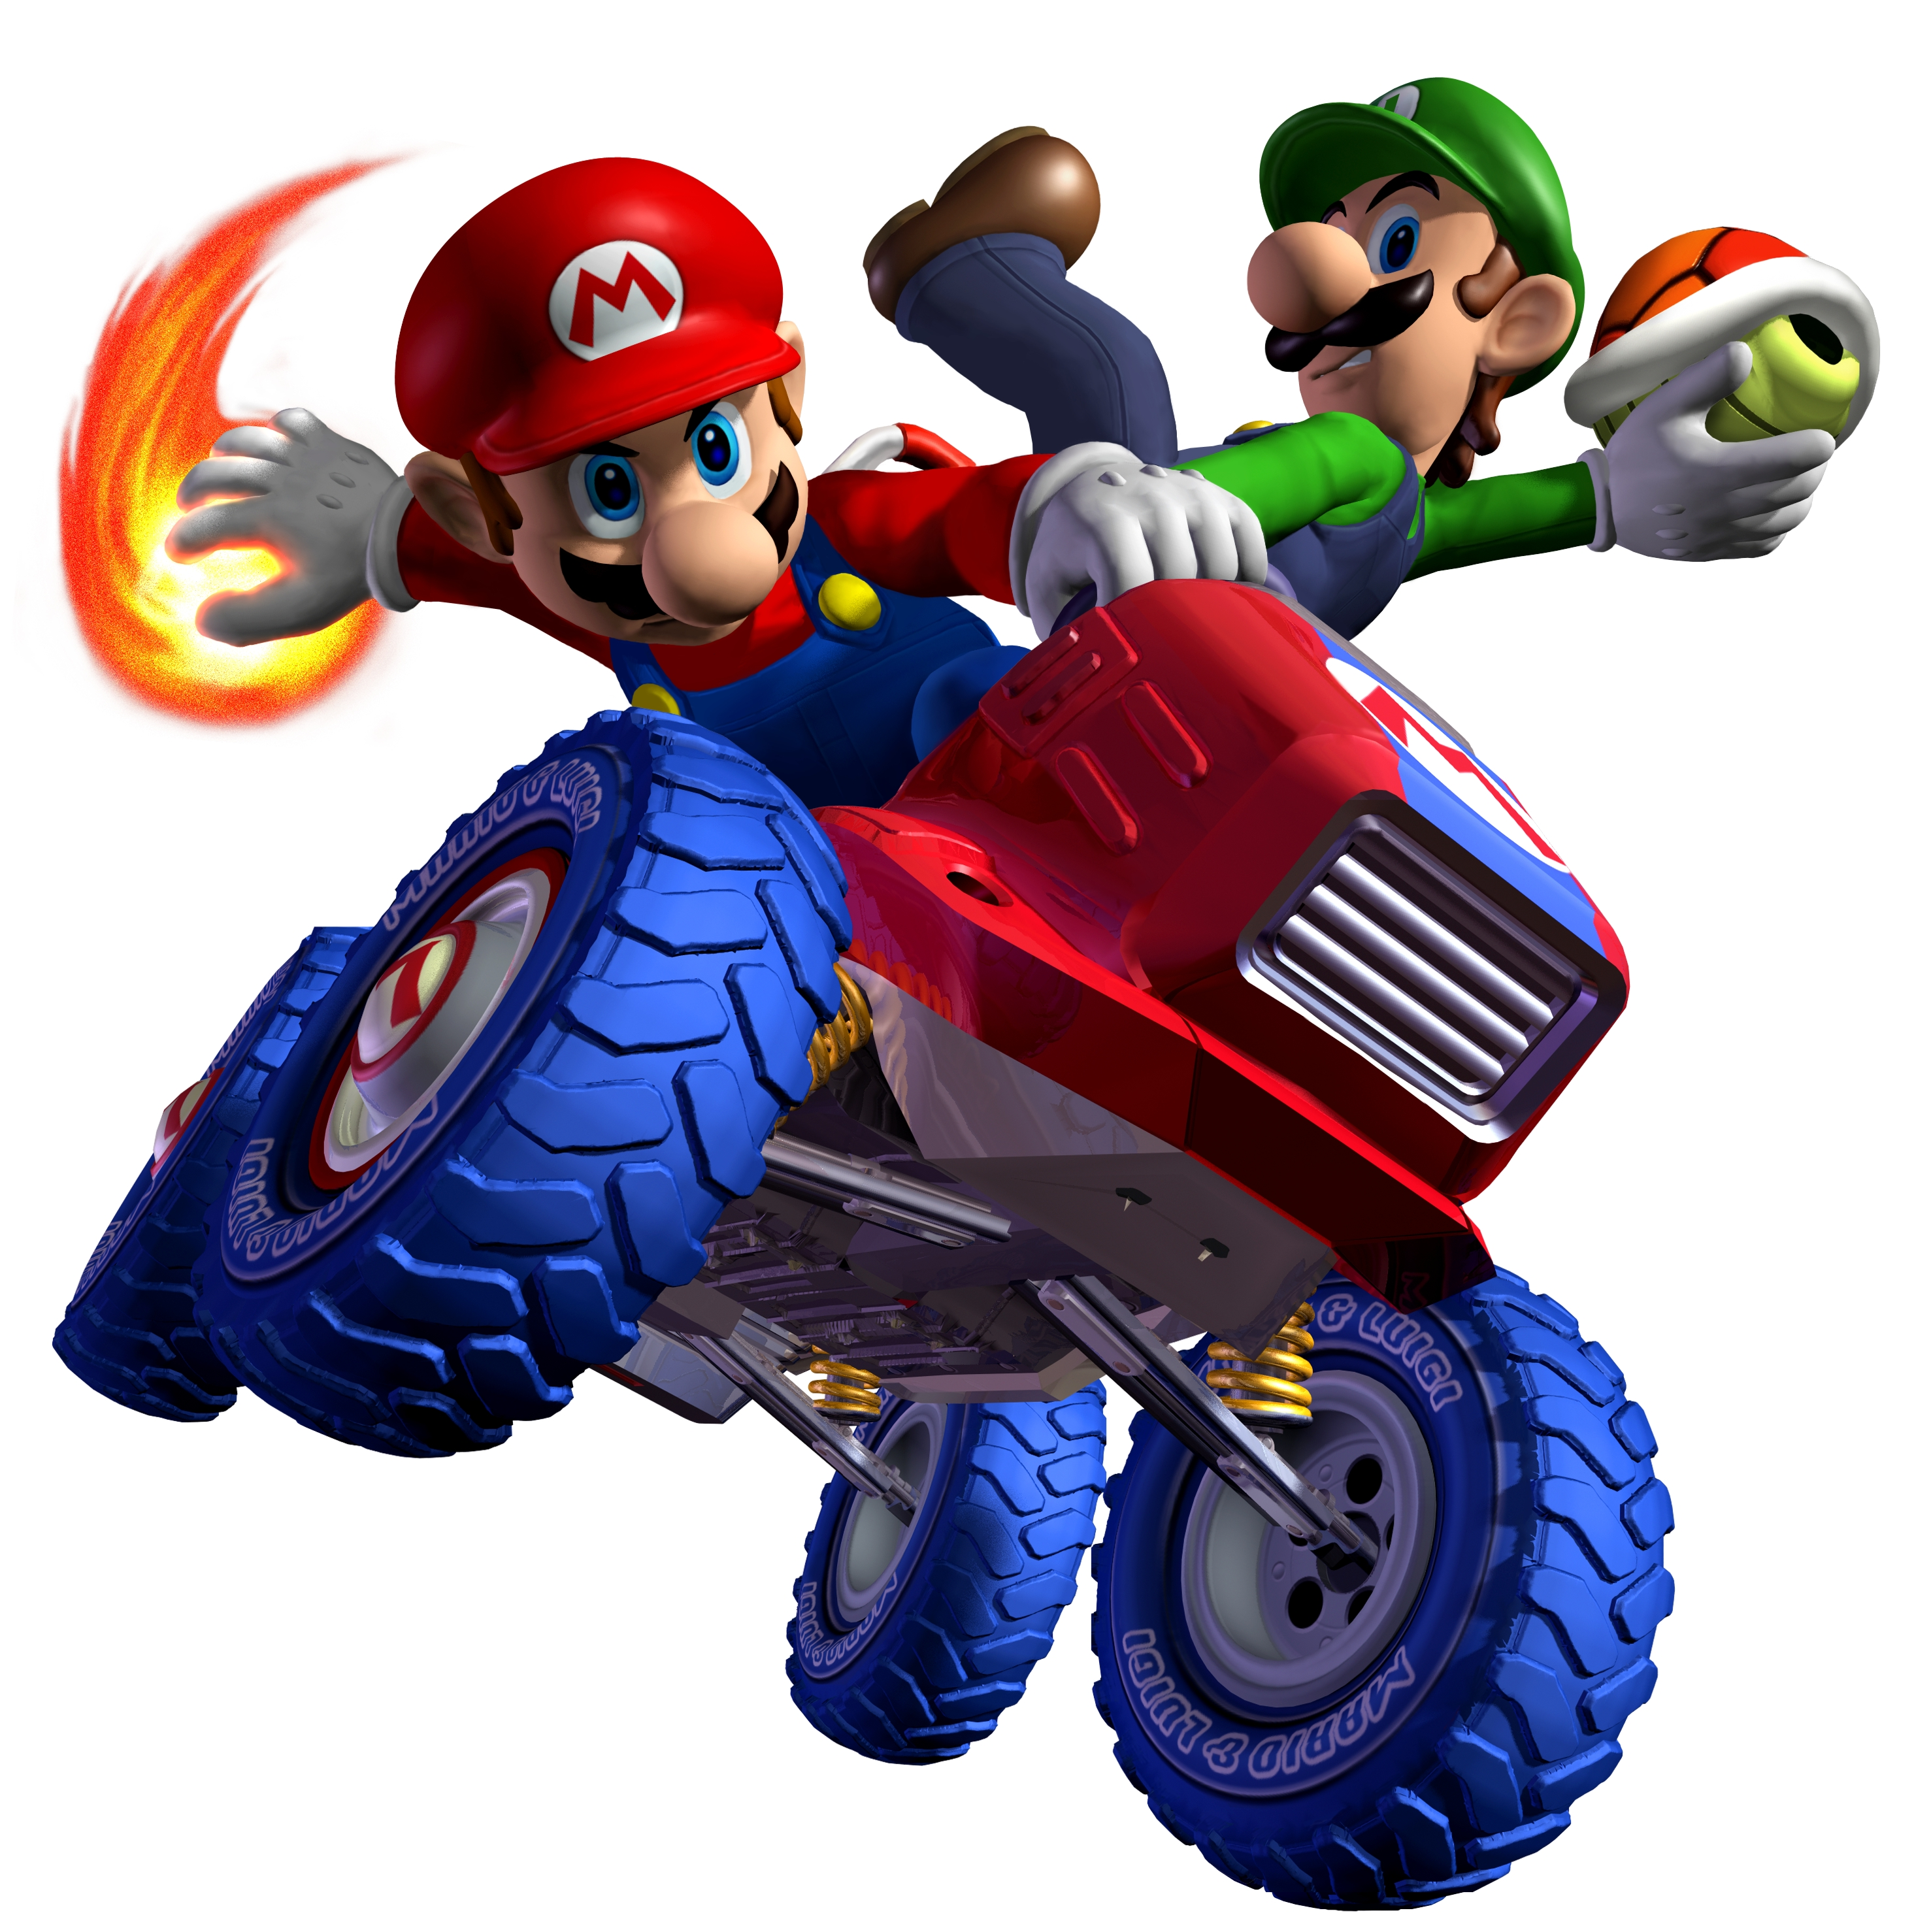 Mario Kart Double Dash Mario Kart Wiki Fandom